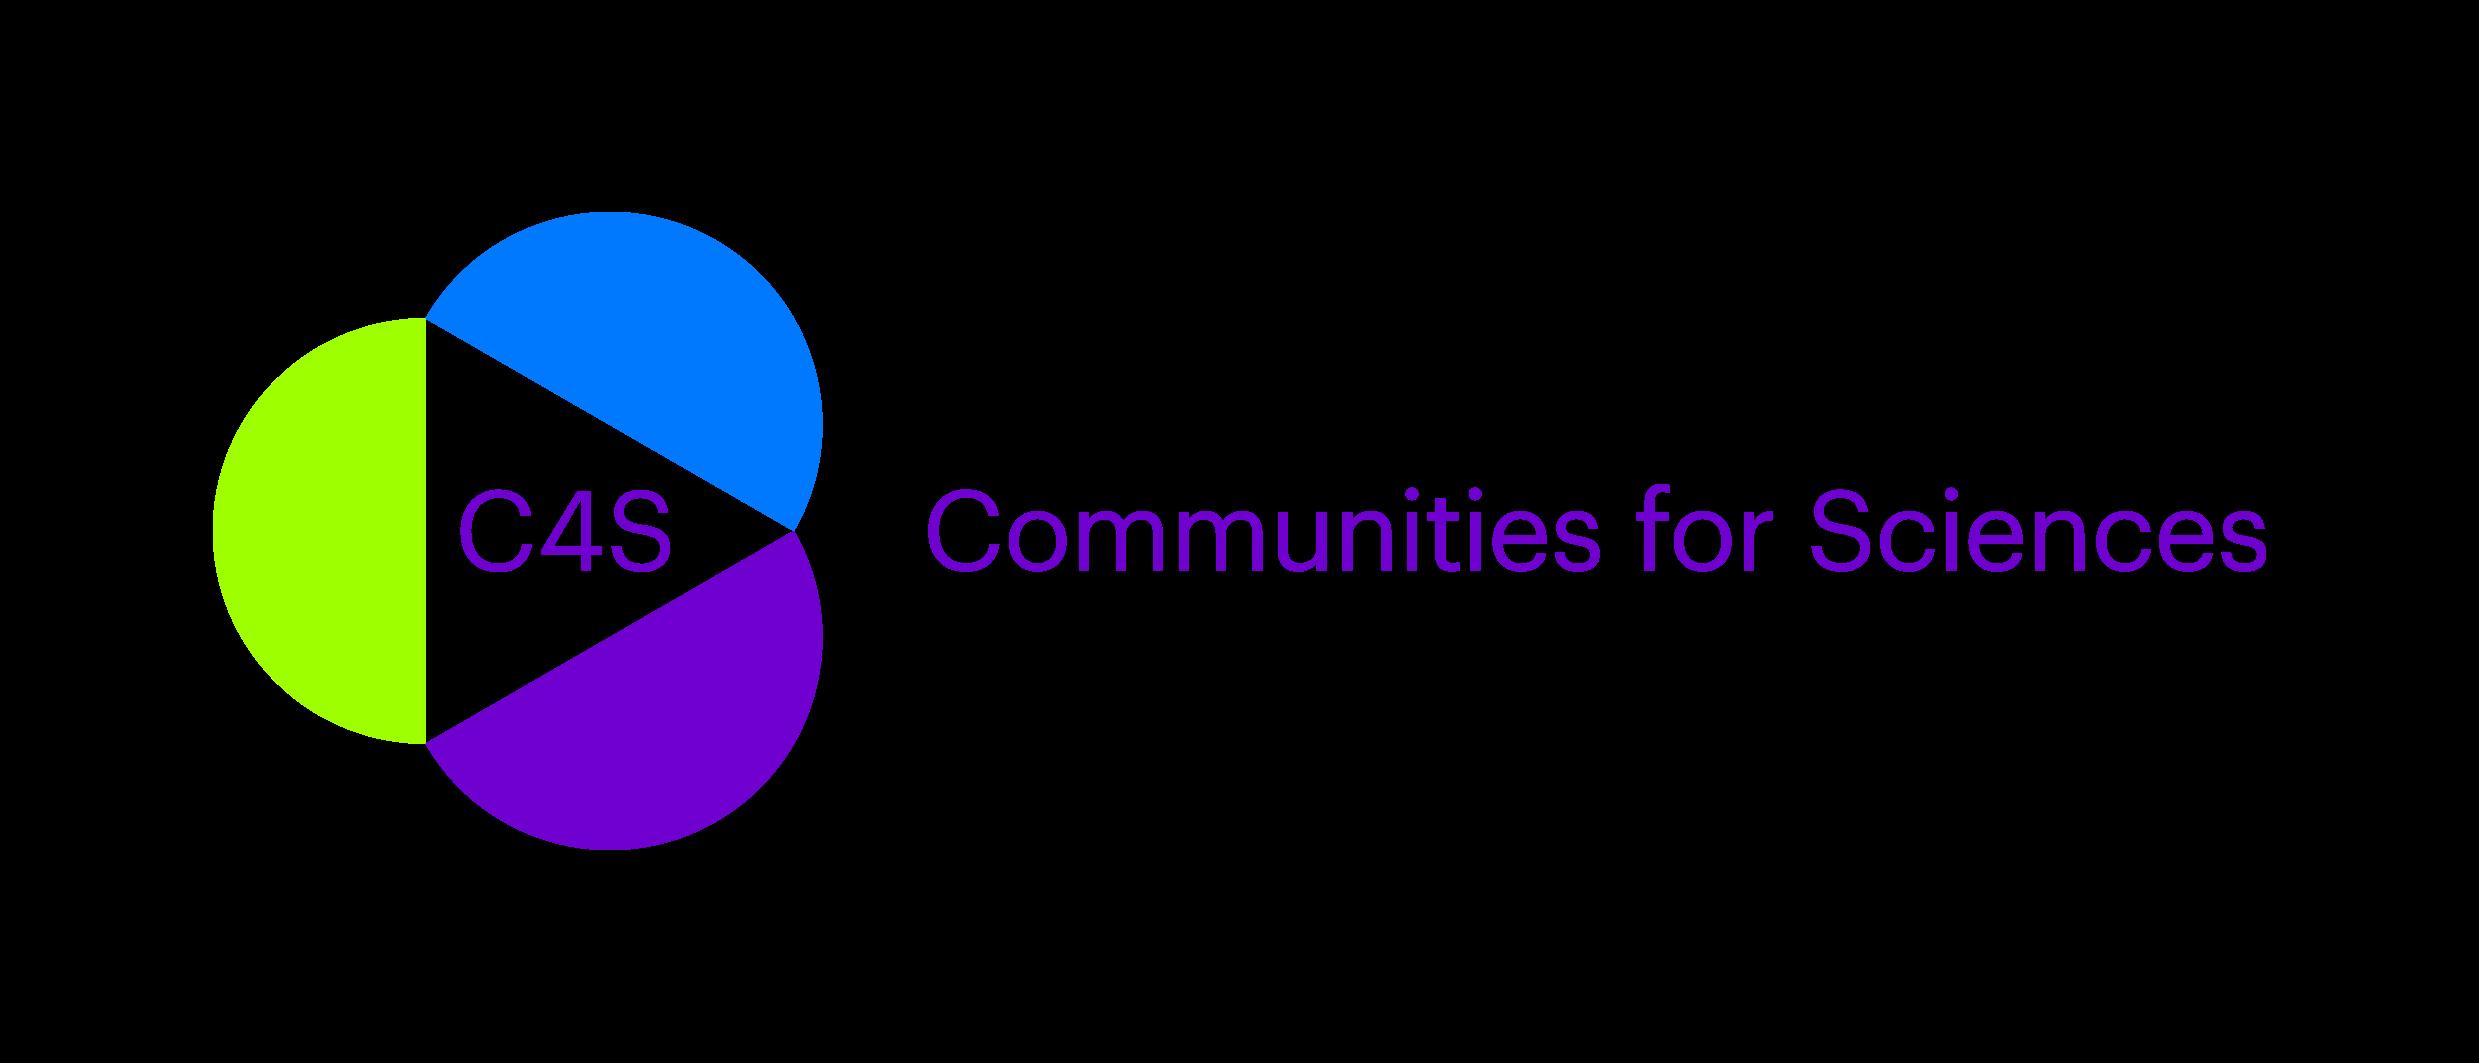 Communities for Sciences